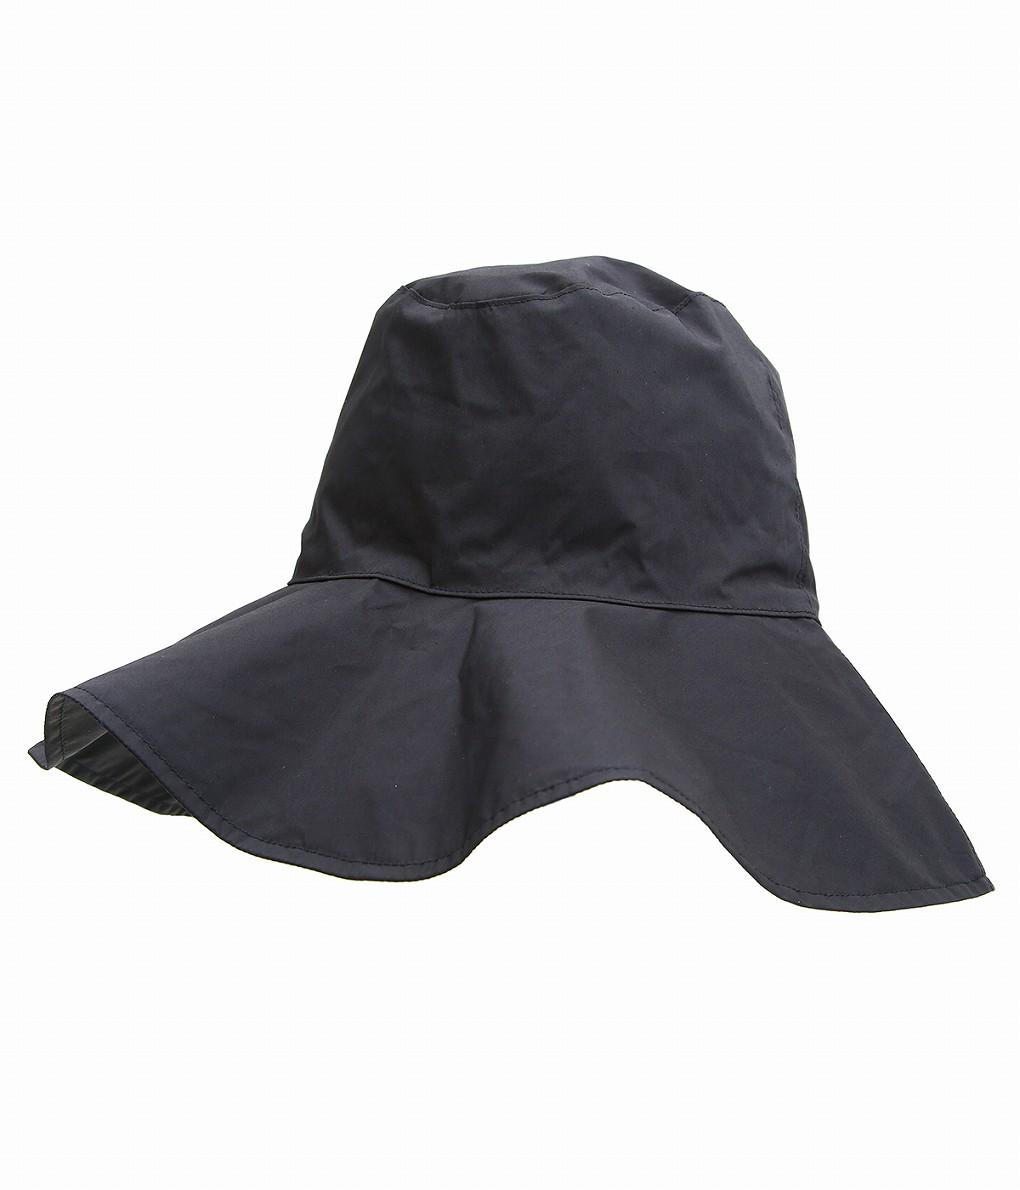 KIJIMA TAKAYUKI / キジマ タカユキ : 【レディース】ワイドブリムソフトハット / 全2色 : ワイドブリムソフト ハット キジマタカユキ 帽子 レディース : W-201242 【ANN】